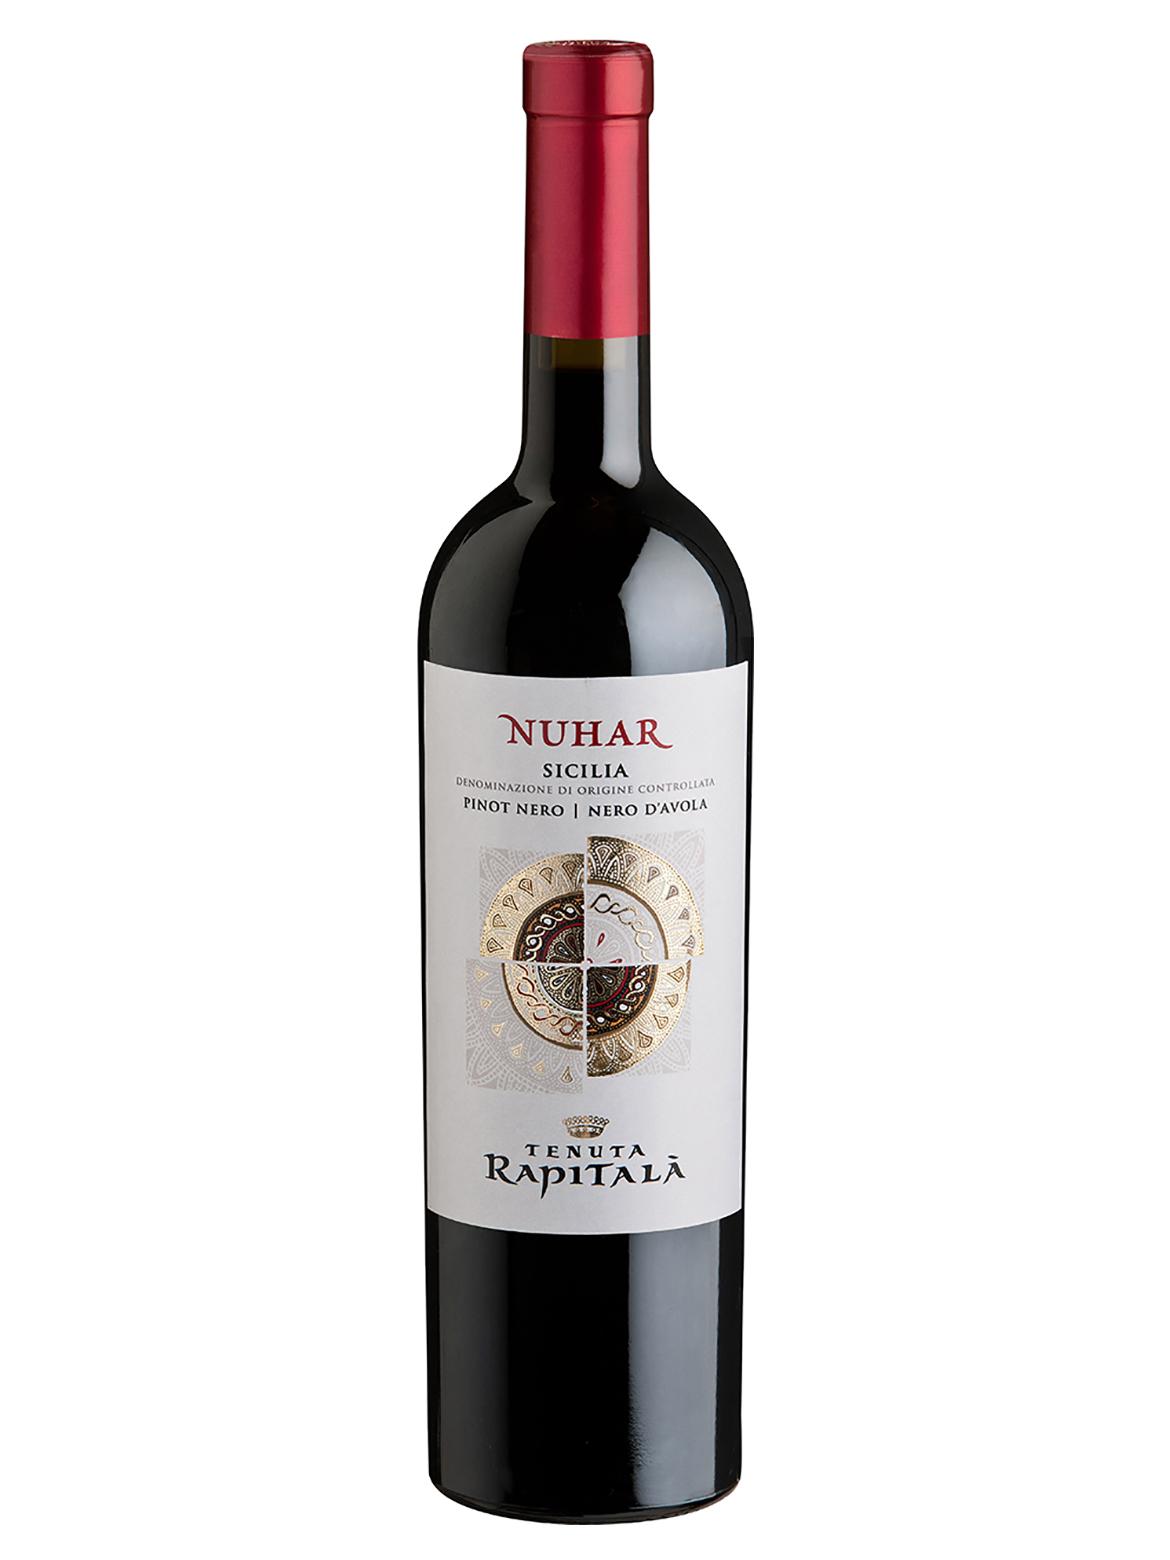 NUHAR - Pinot Nero/Nero d'Avola Sicilia DOC